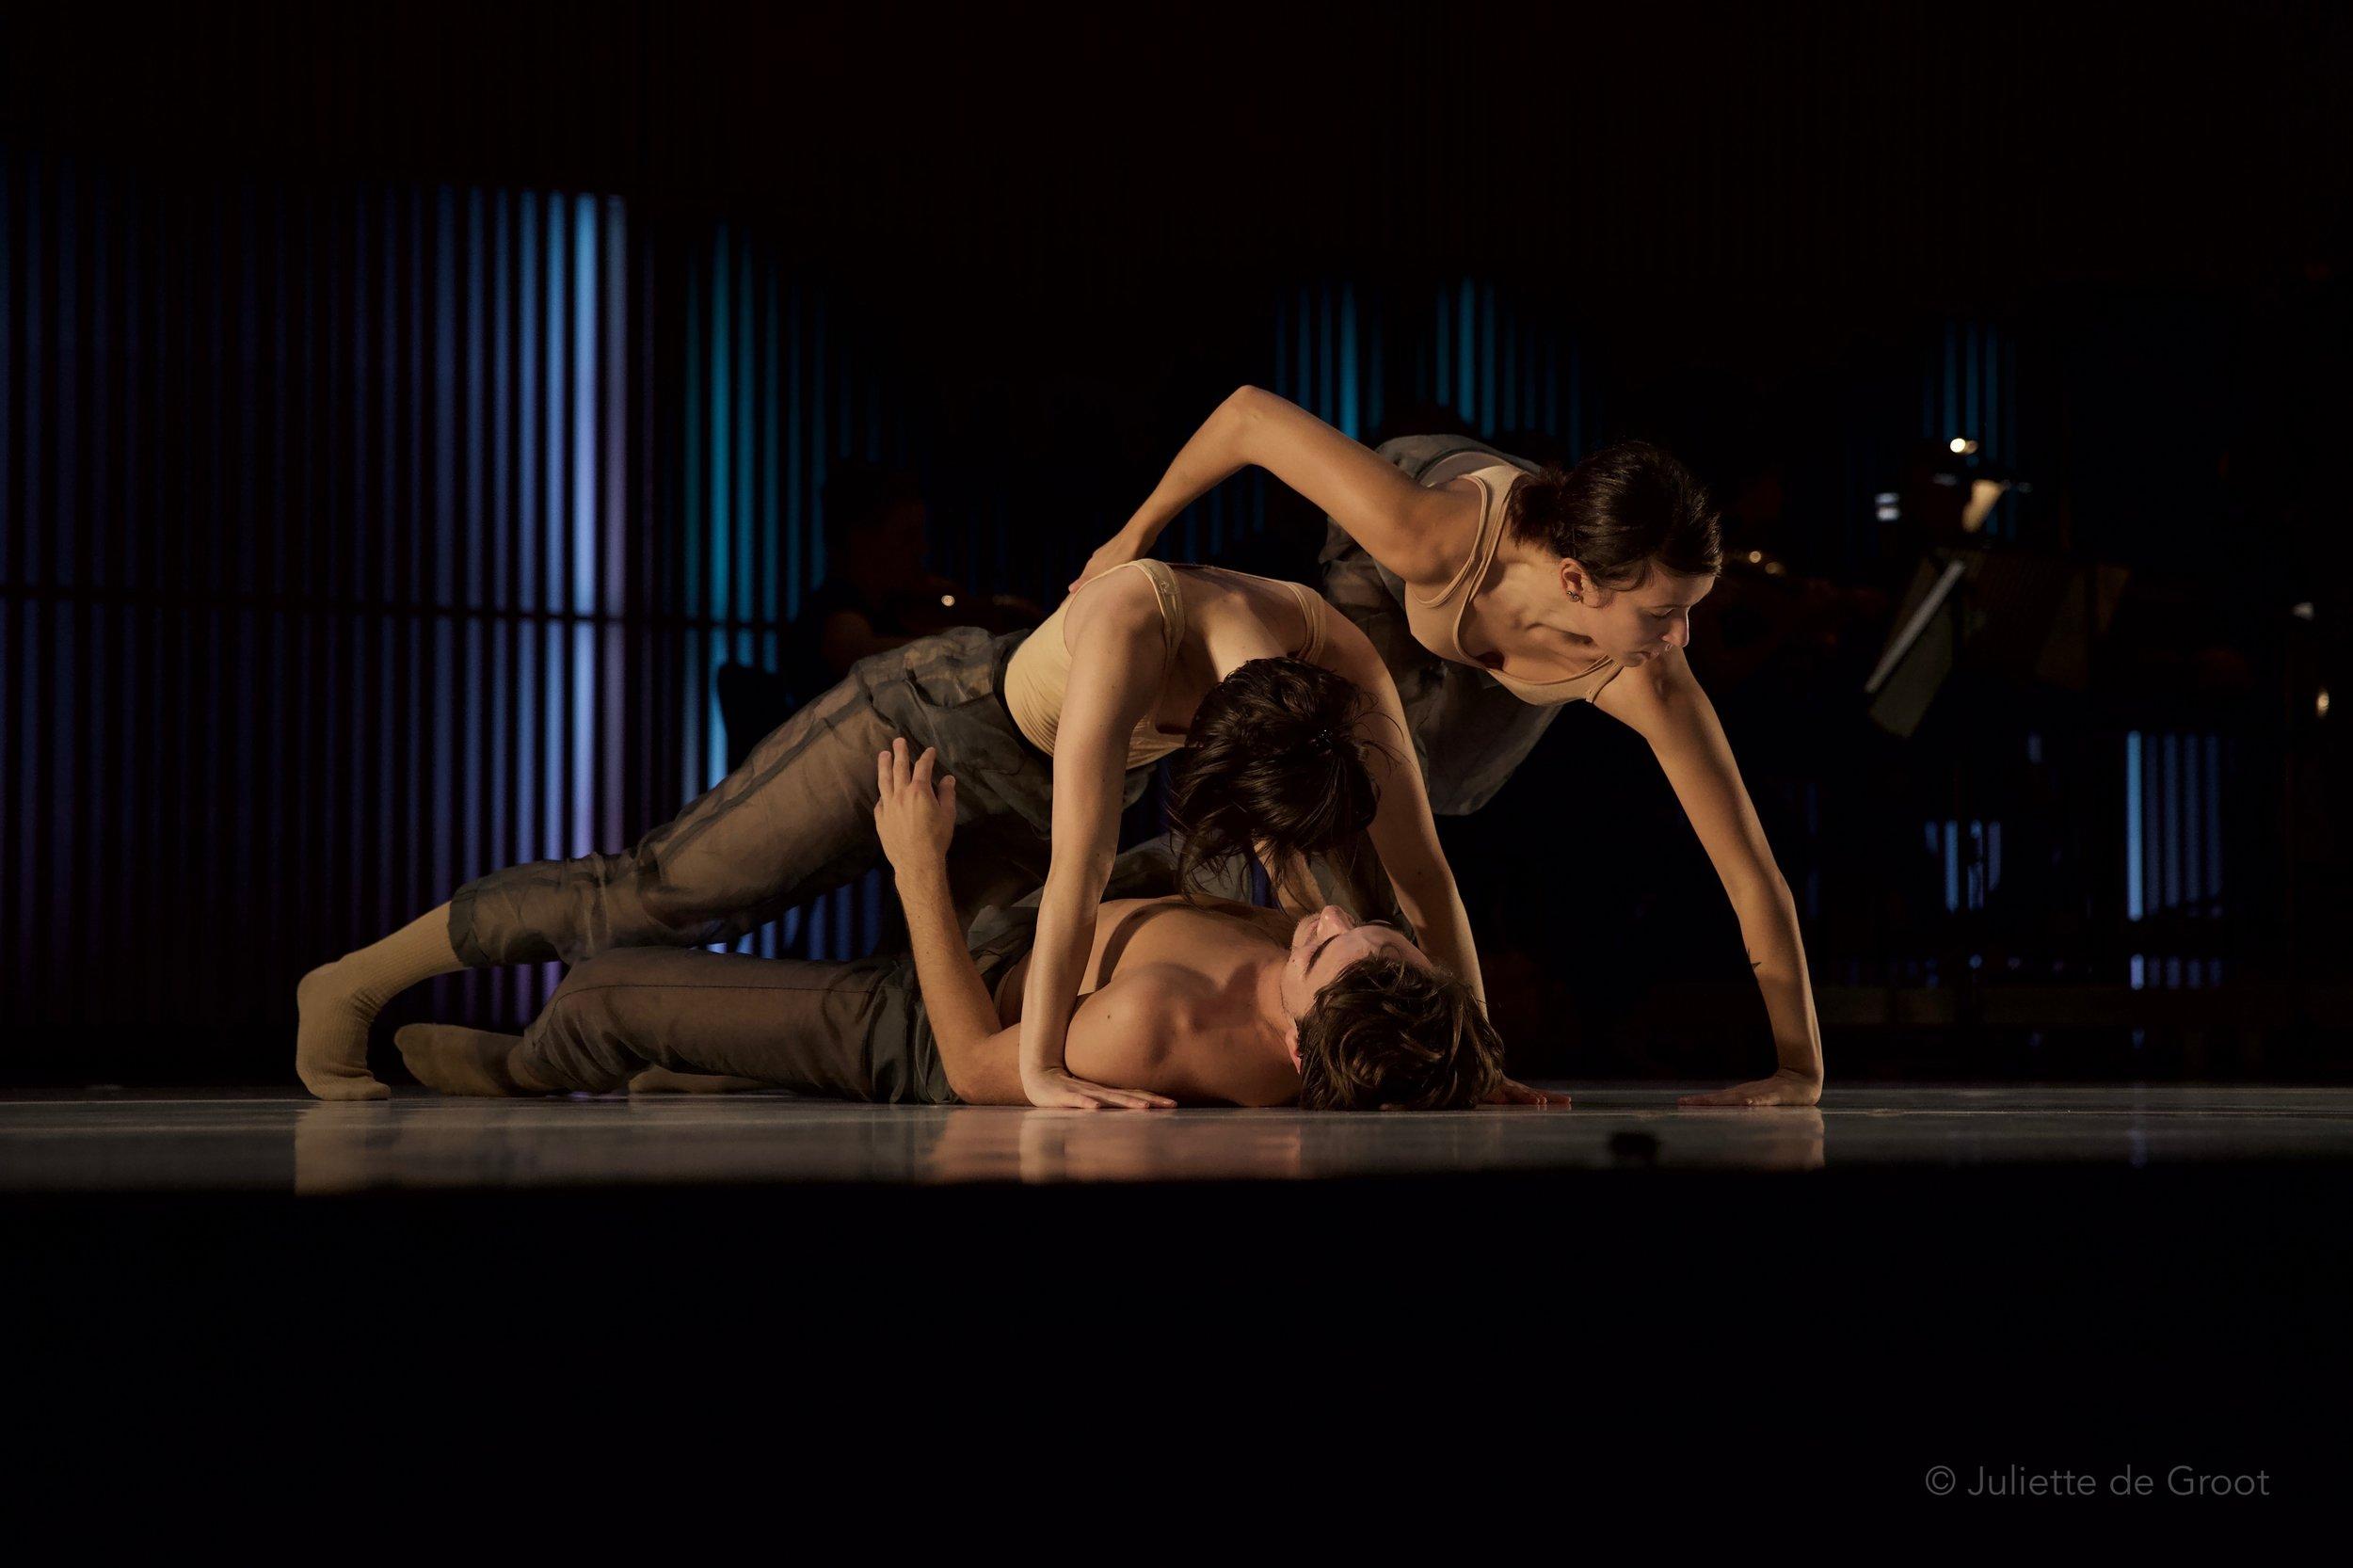 Dancers Erika Poletto, Sophie Vergeres, Frederik Kaijser 'Stabat Mater' Photography ©Juliette de Groot